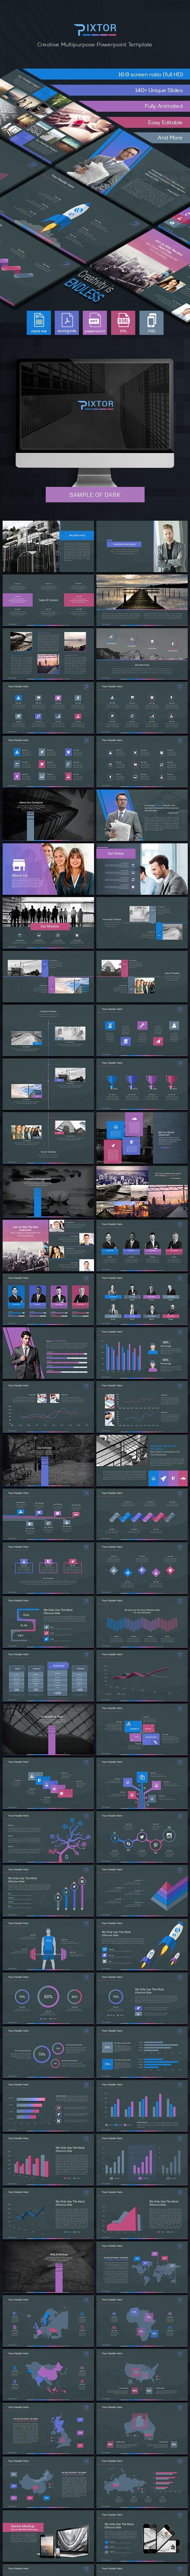 Pixtor - Creative Powerpoint Template - Creative PowerPoint Templates